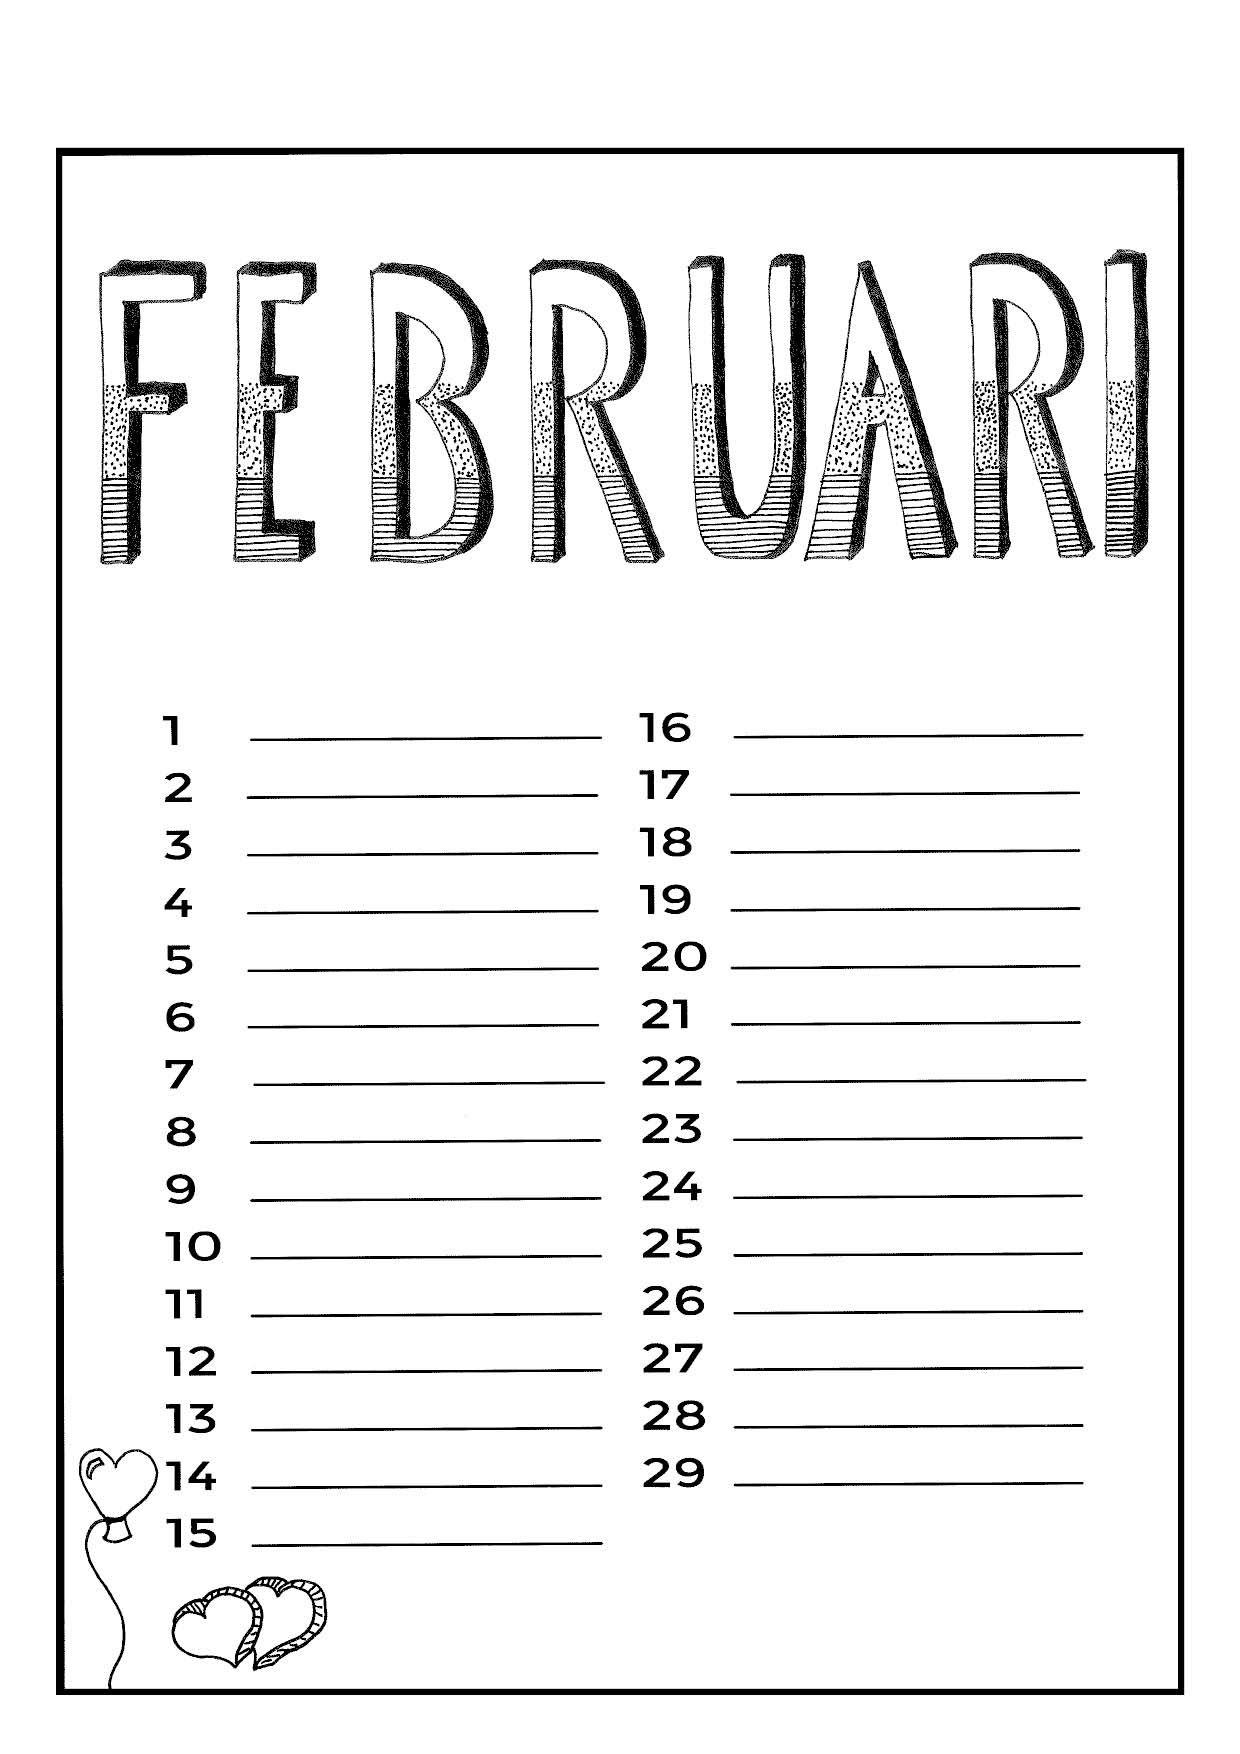 Februari Handlettering Kalender Ideeen Verjaardagskalender